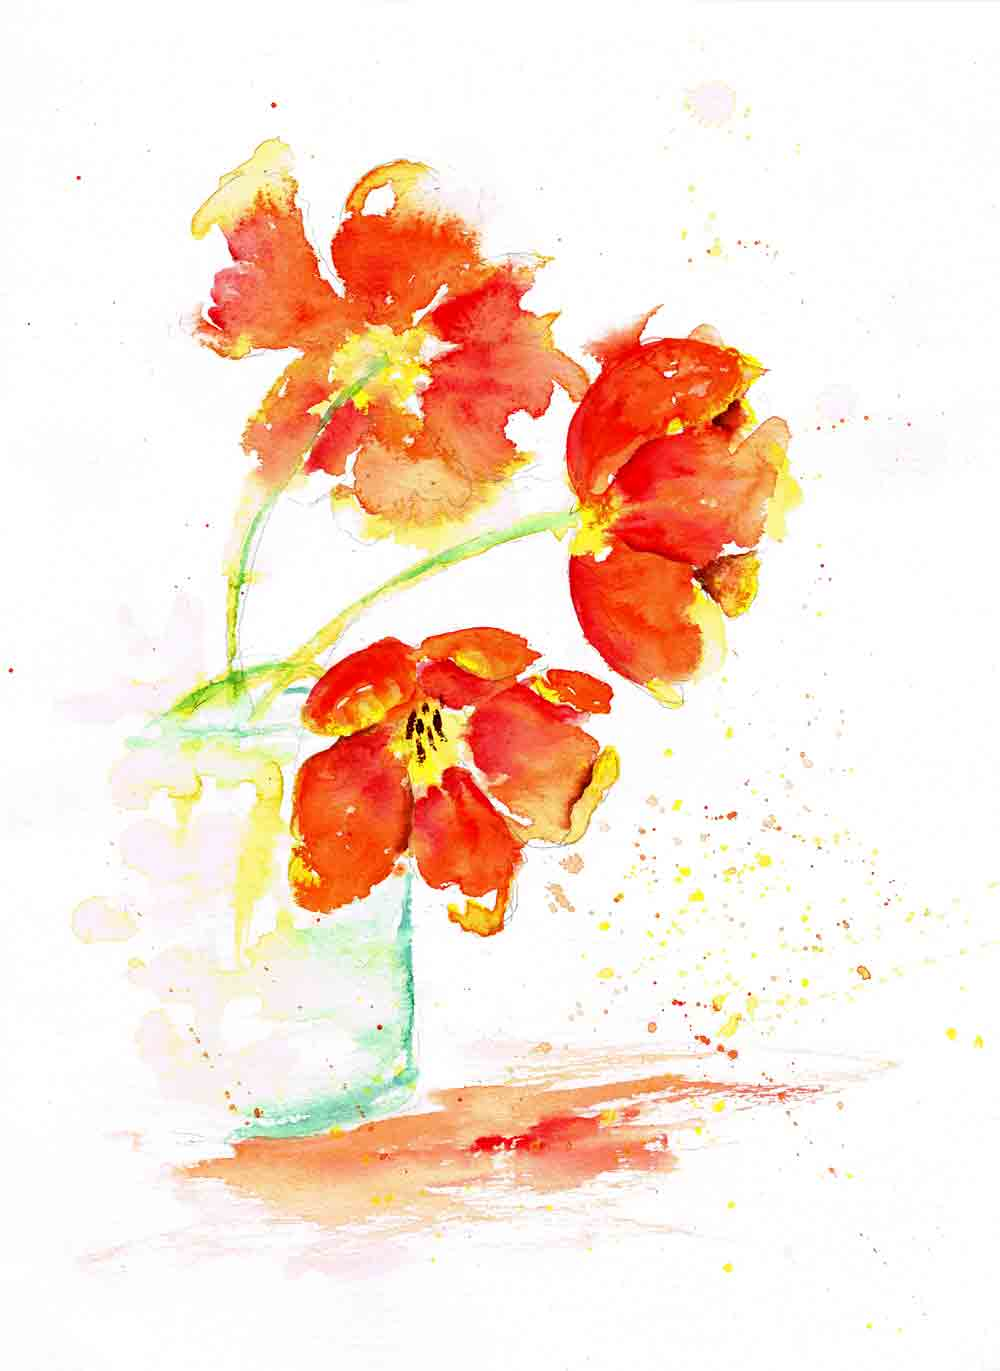 Tulips-no-3-trio-kw.jpg